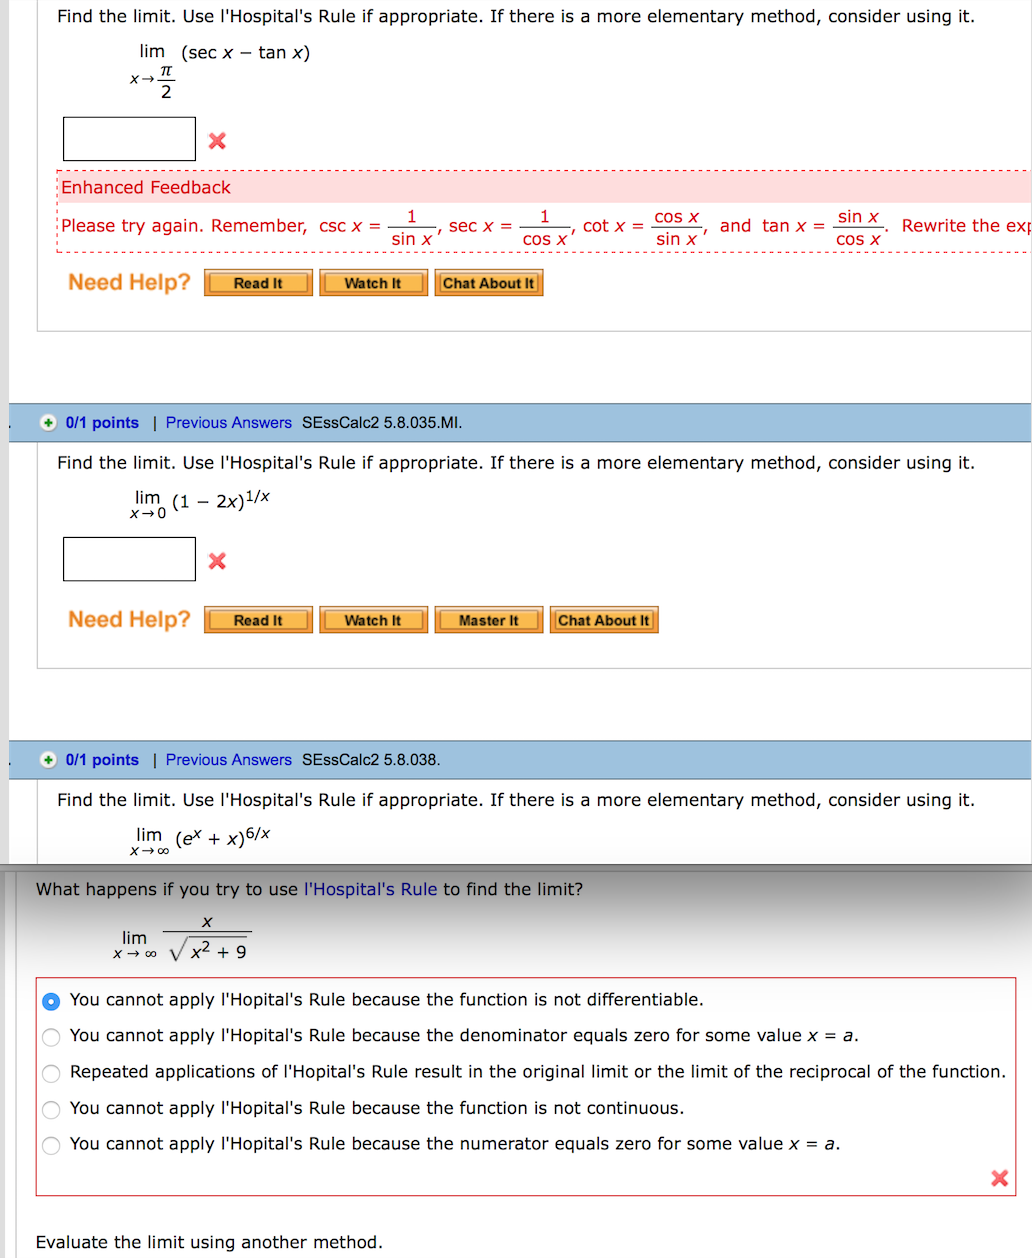 26 U.S. Code § 453 - Installment method